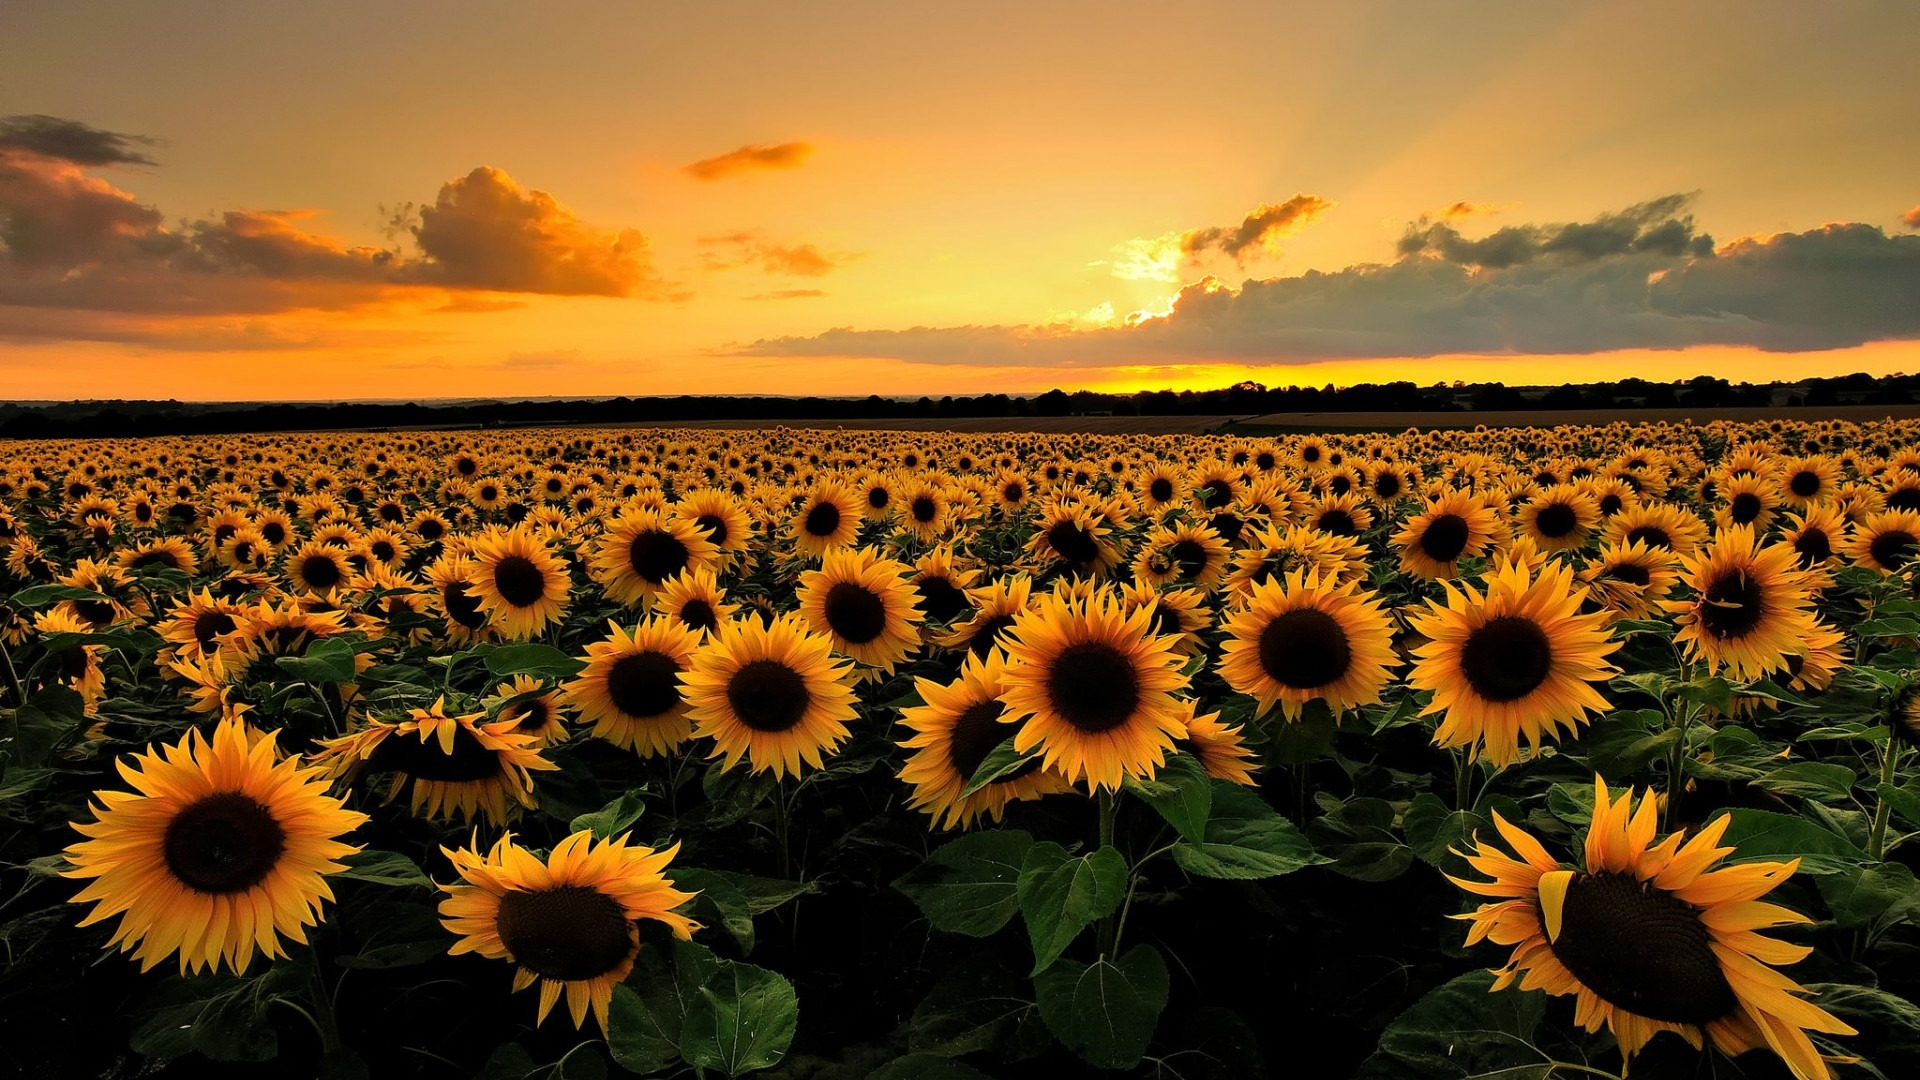 6776626-beautiful-sunflower-field-wallpaper.jpg